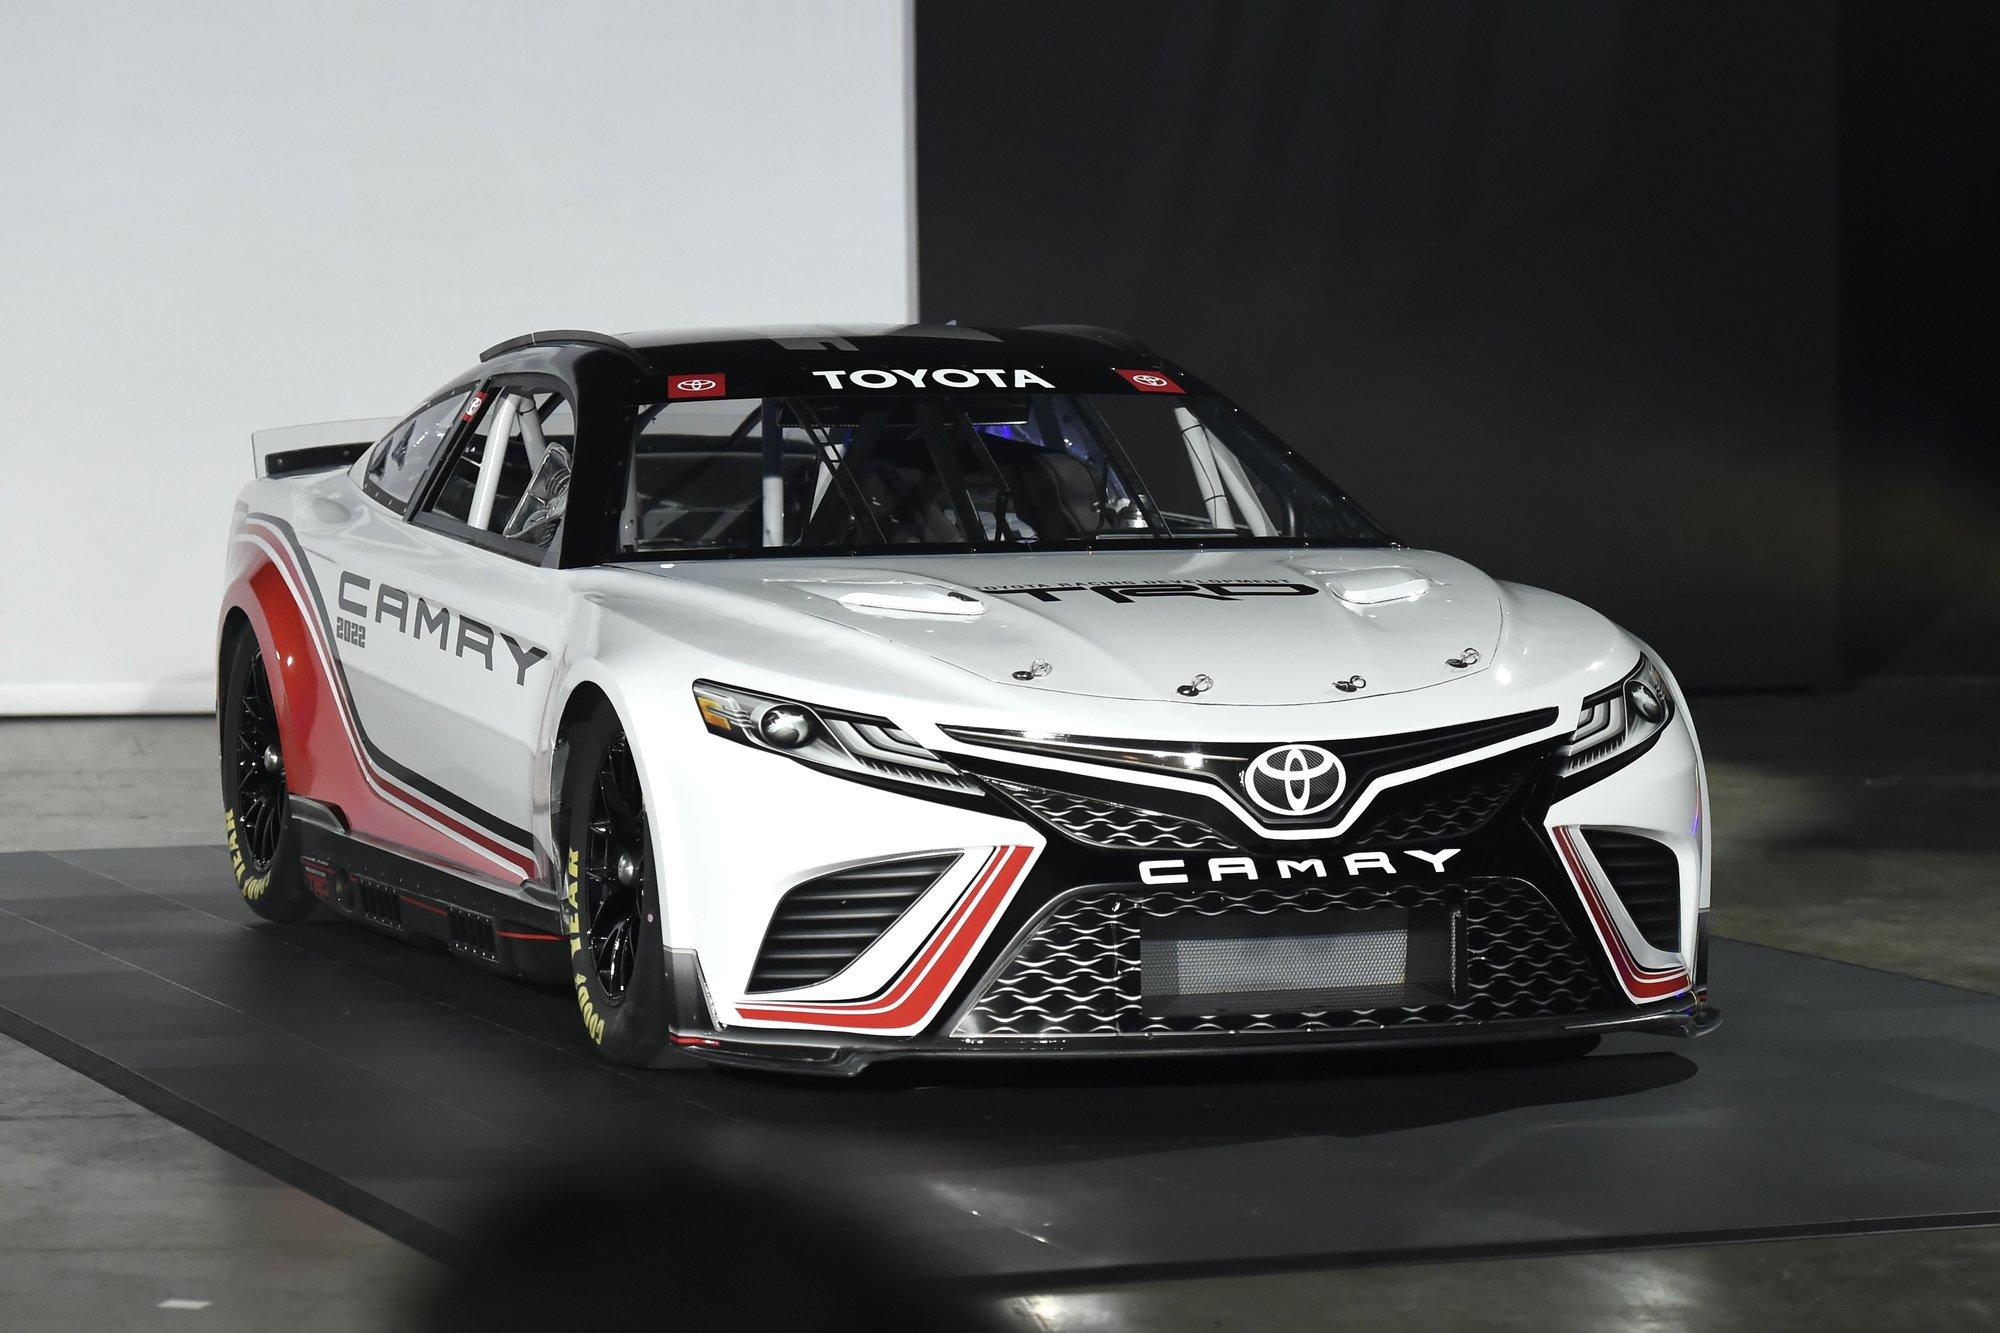 NASCAR_Next_Gen_Auto_Racing.thumb.jpg.29e2dd1e1801e4d6c042c8bf76ef0712.jpg